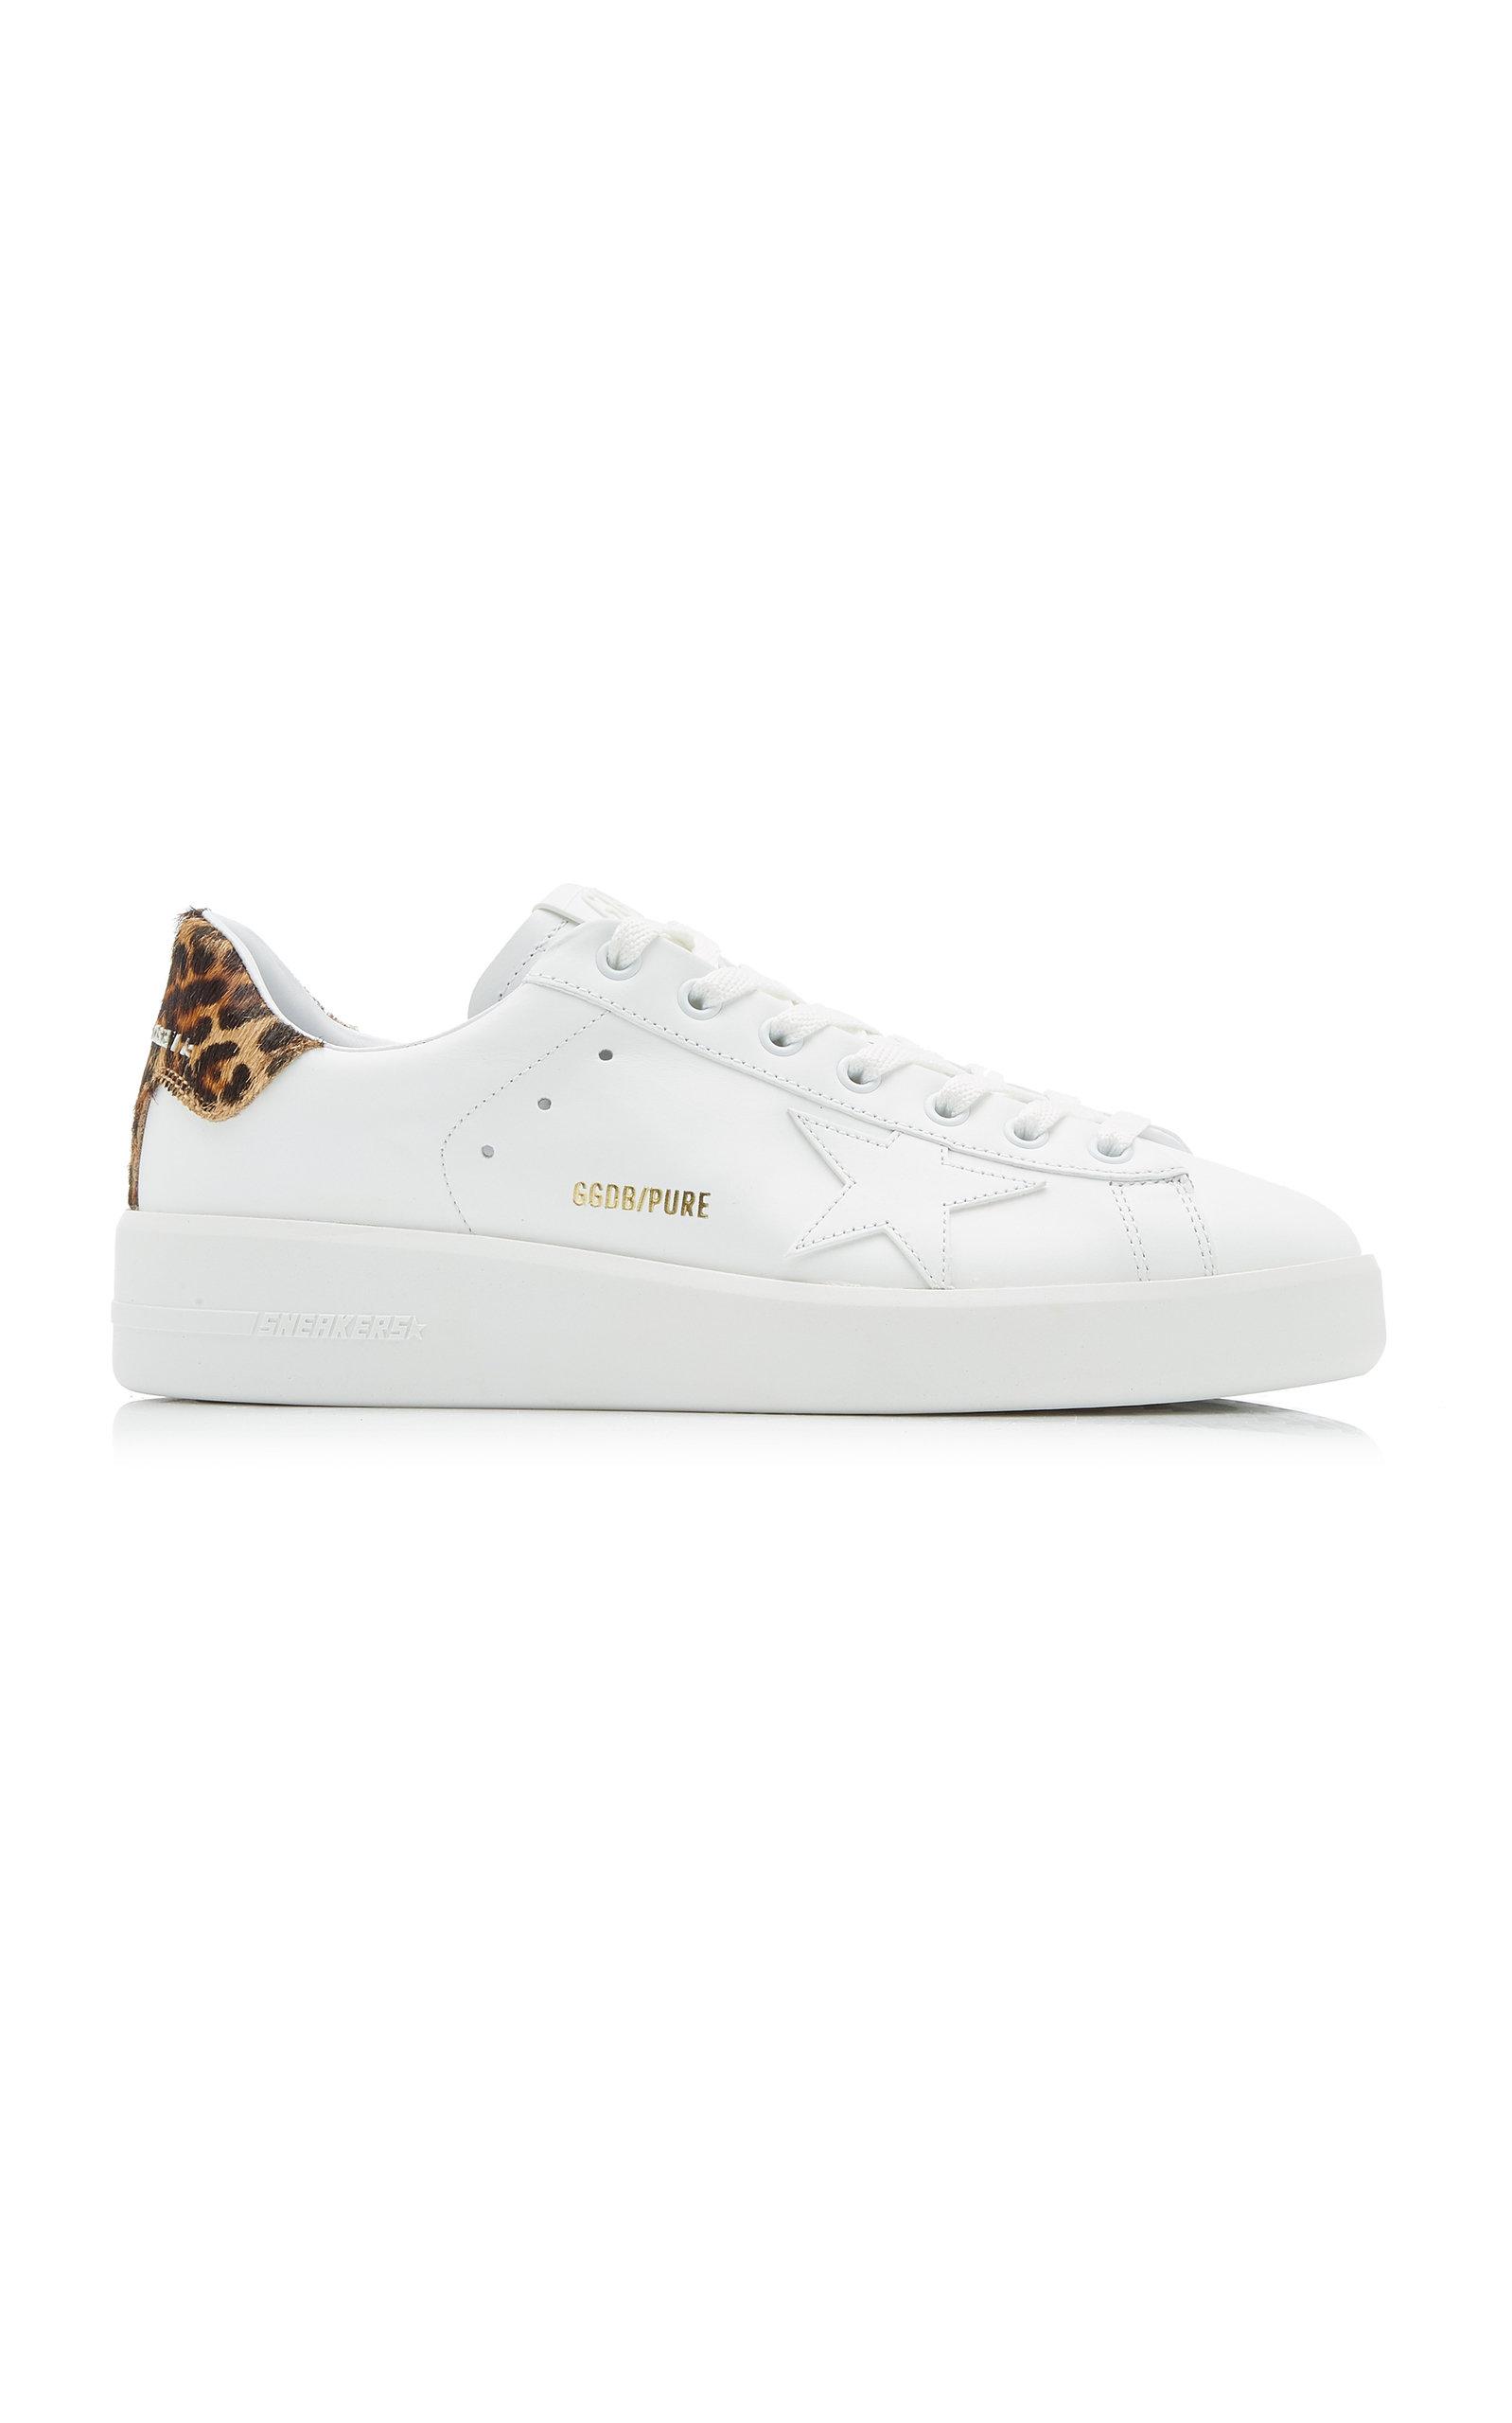 Golden Goose - Women's Pure Star Leopard Calf Hair And Leather Sneakers - White - Moda Operandi